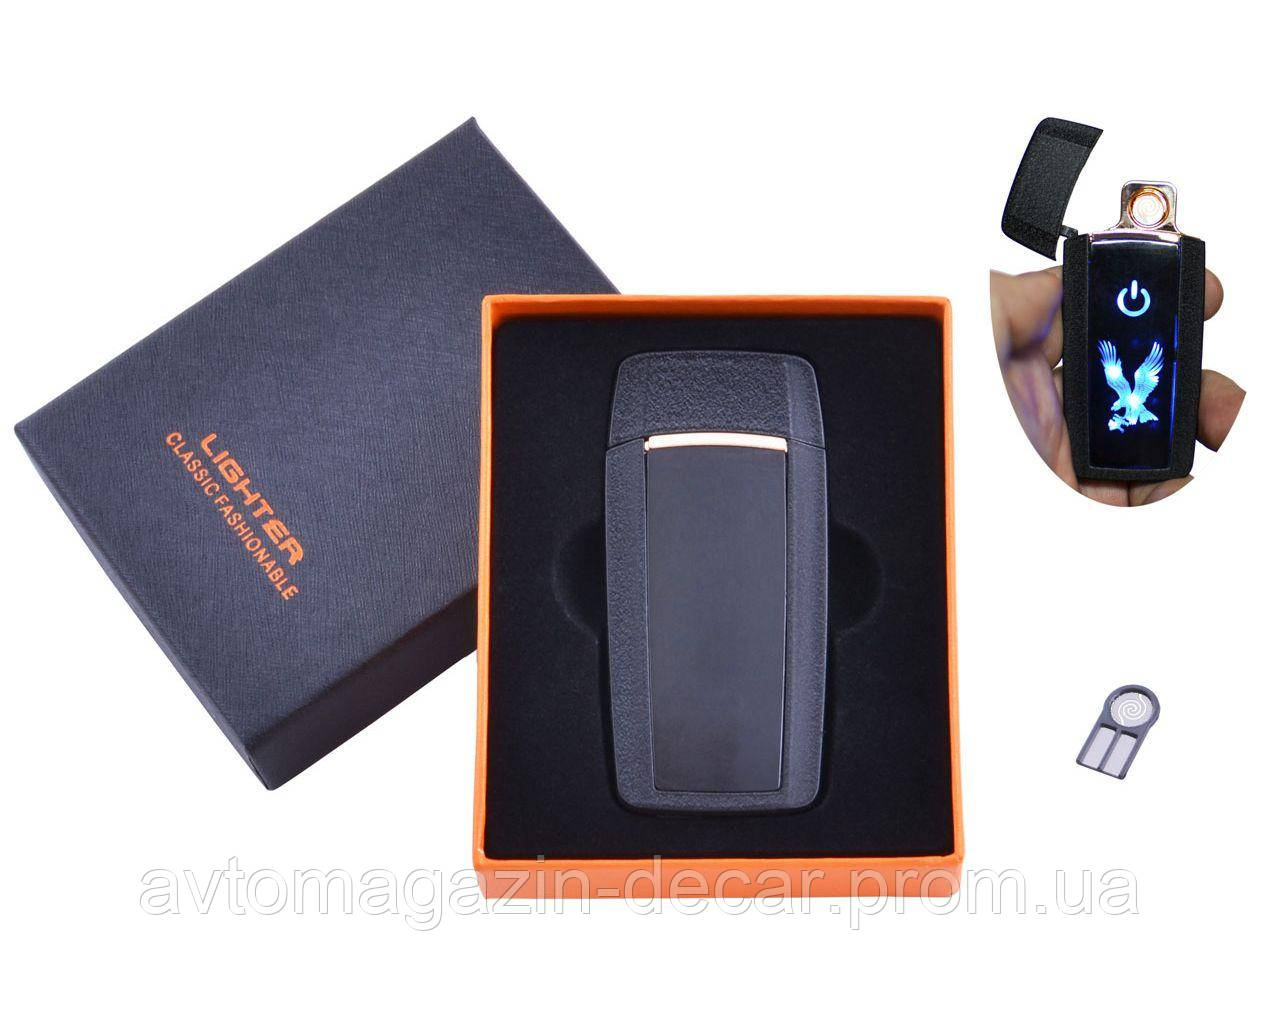 Зажигалка USB спираль накаливания+1 запасная/сенсорная кнопка/Герб Black/Gold/Silver HL-55